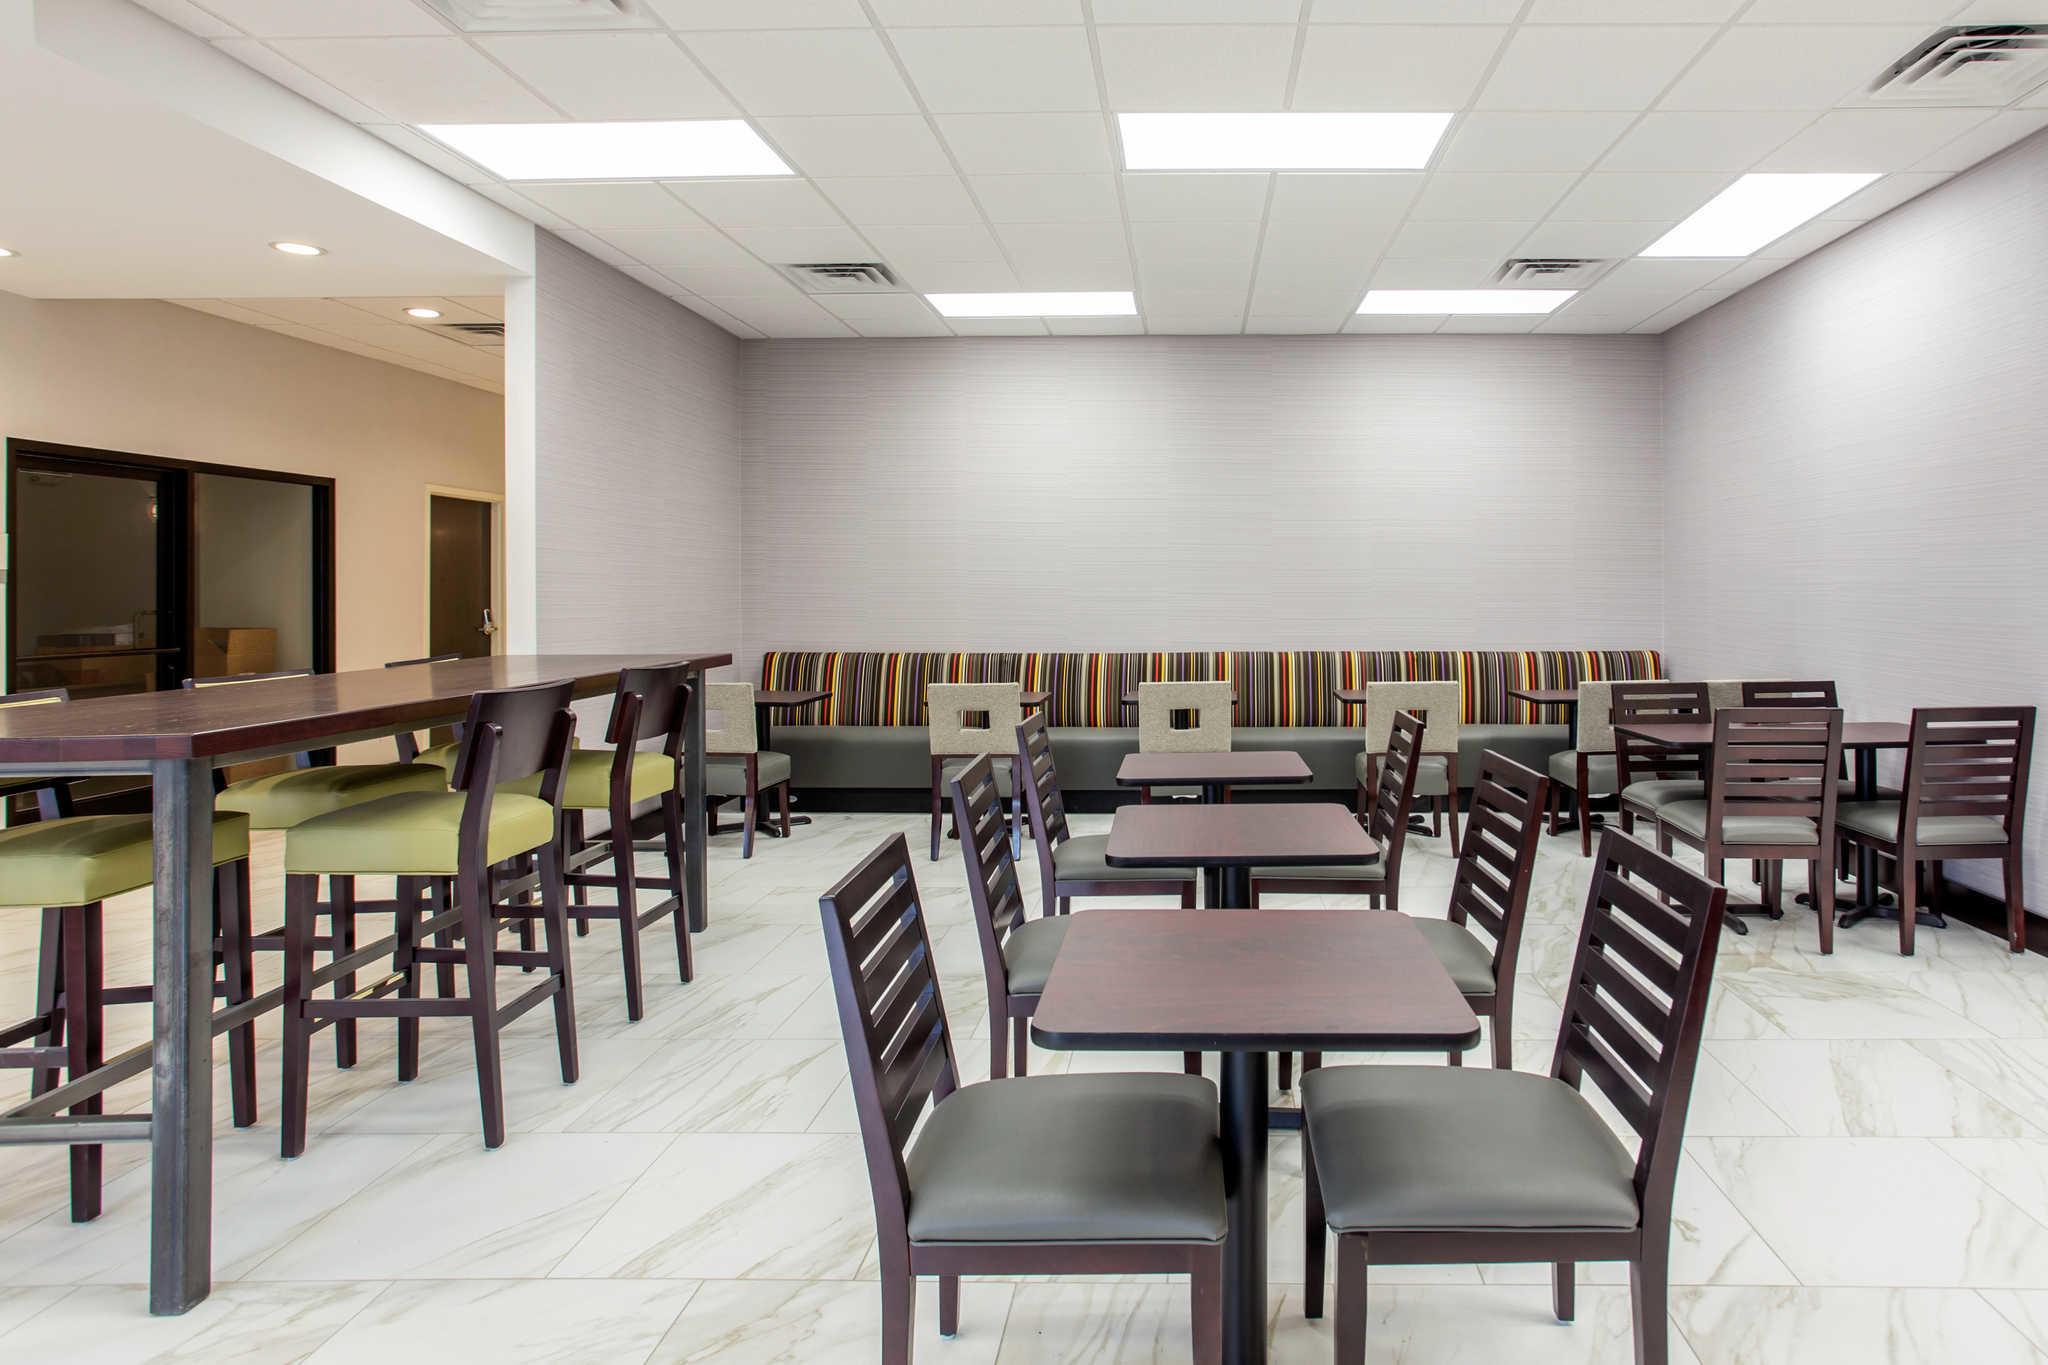 Clarion Inn & Suites image 27